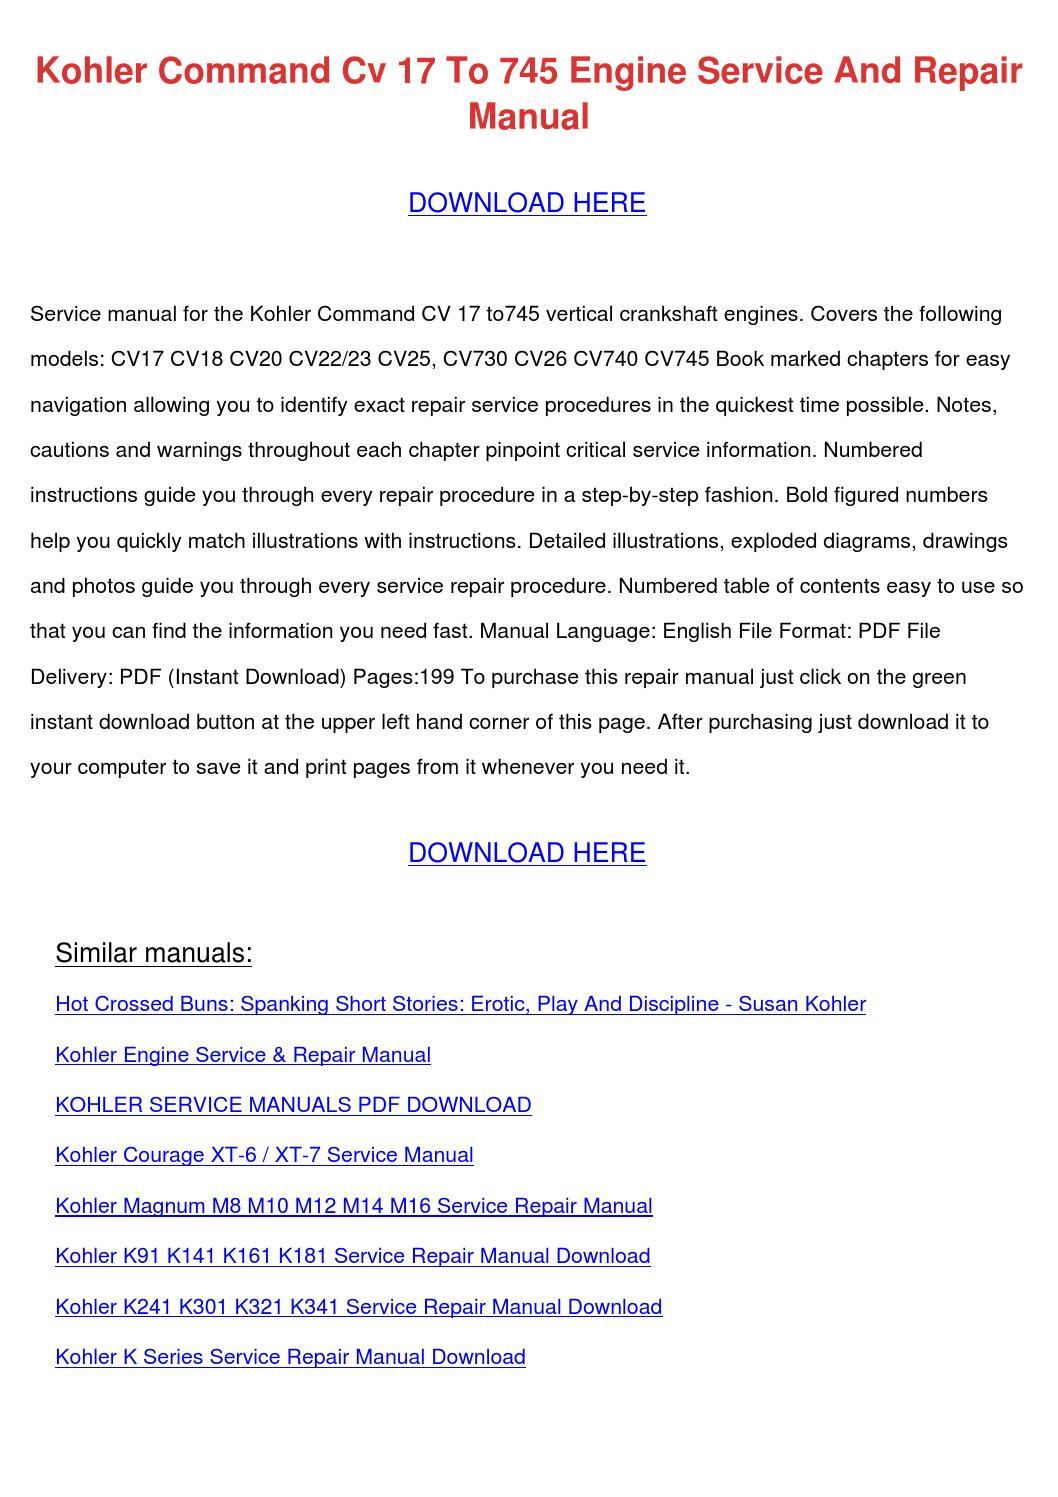 Kohler Command Cv 17 To 745 Engine Service An by FranElizondo - issuu